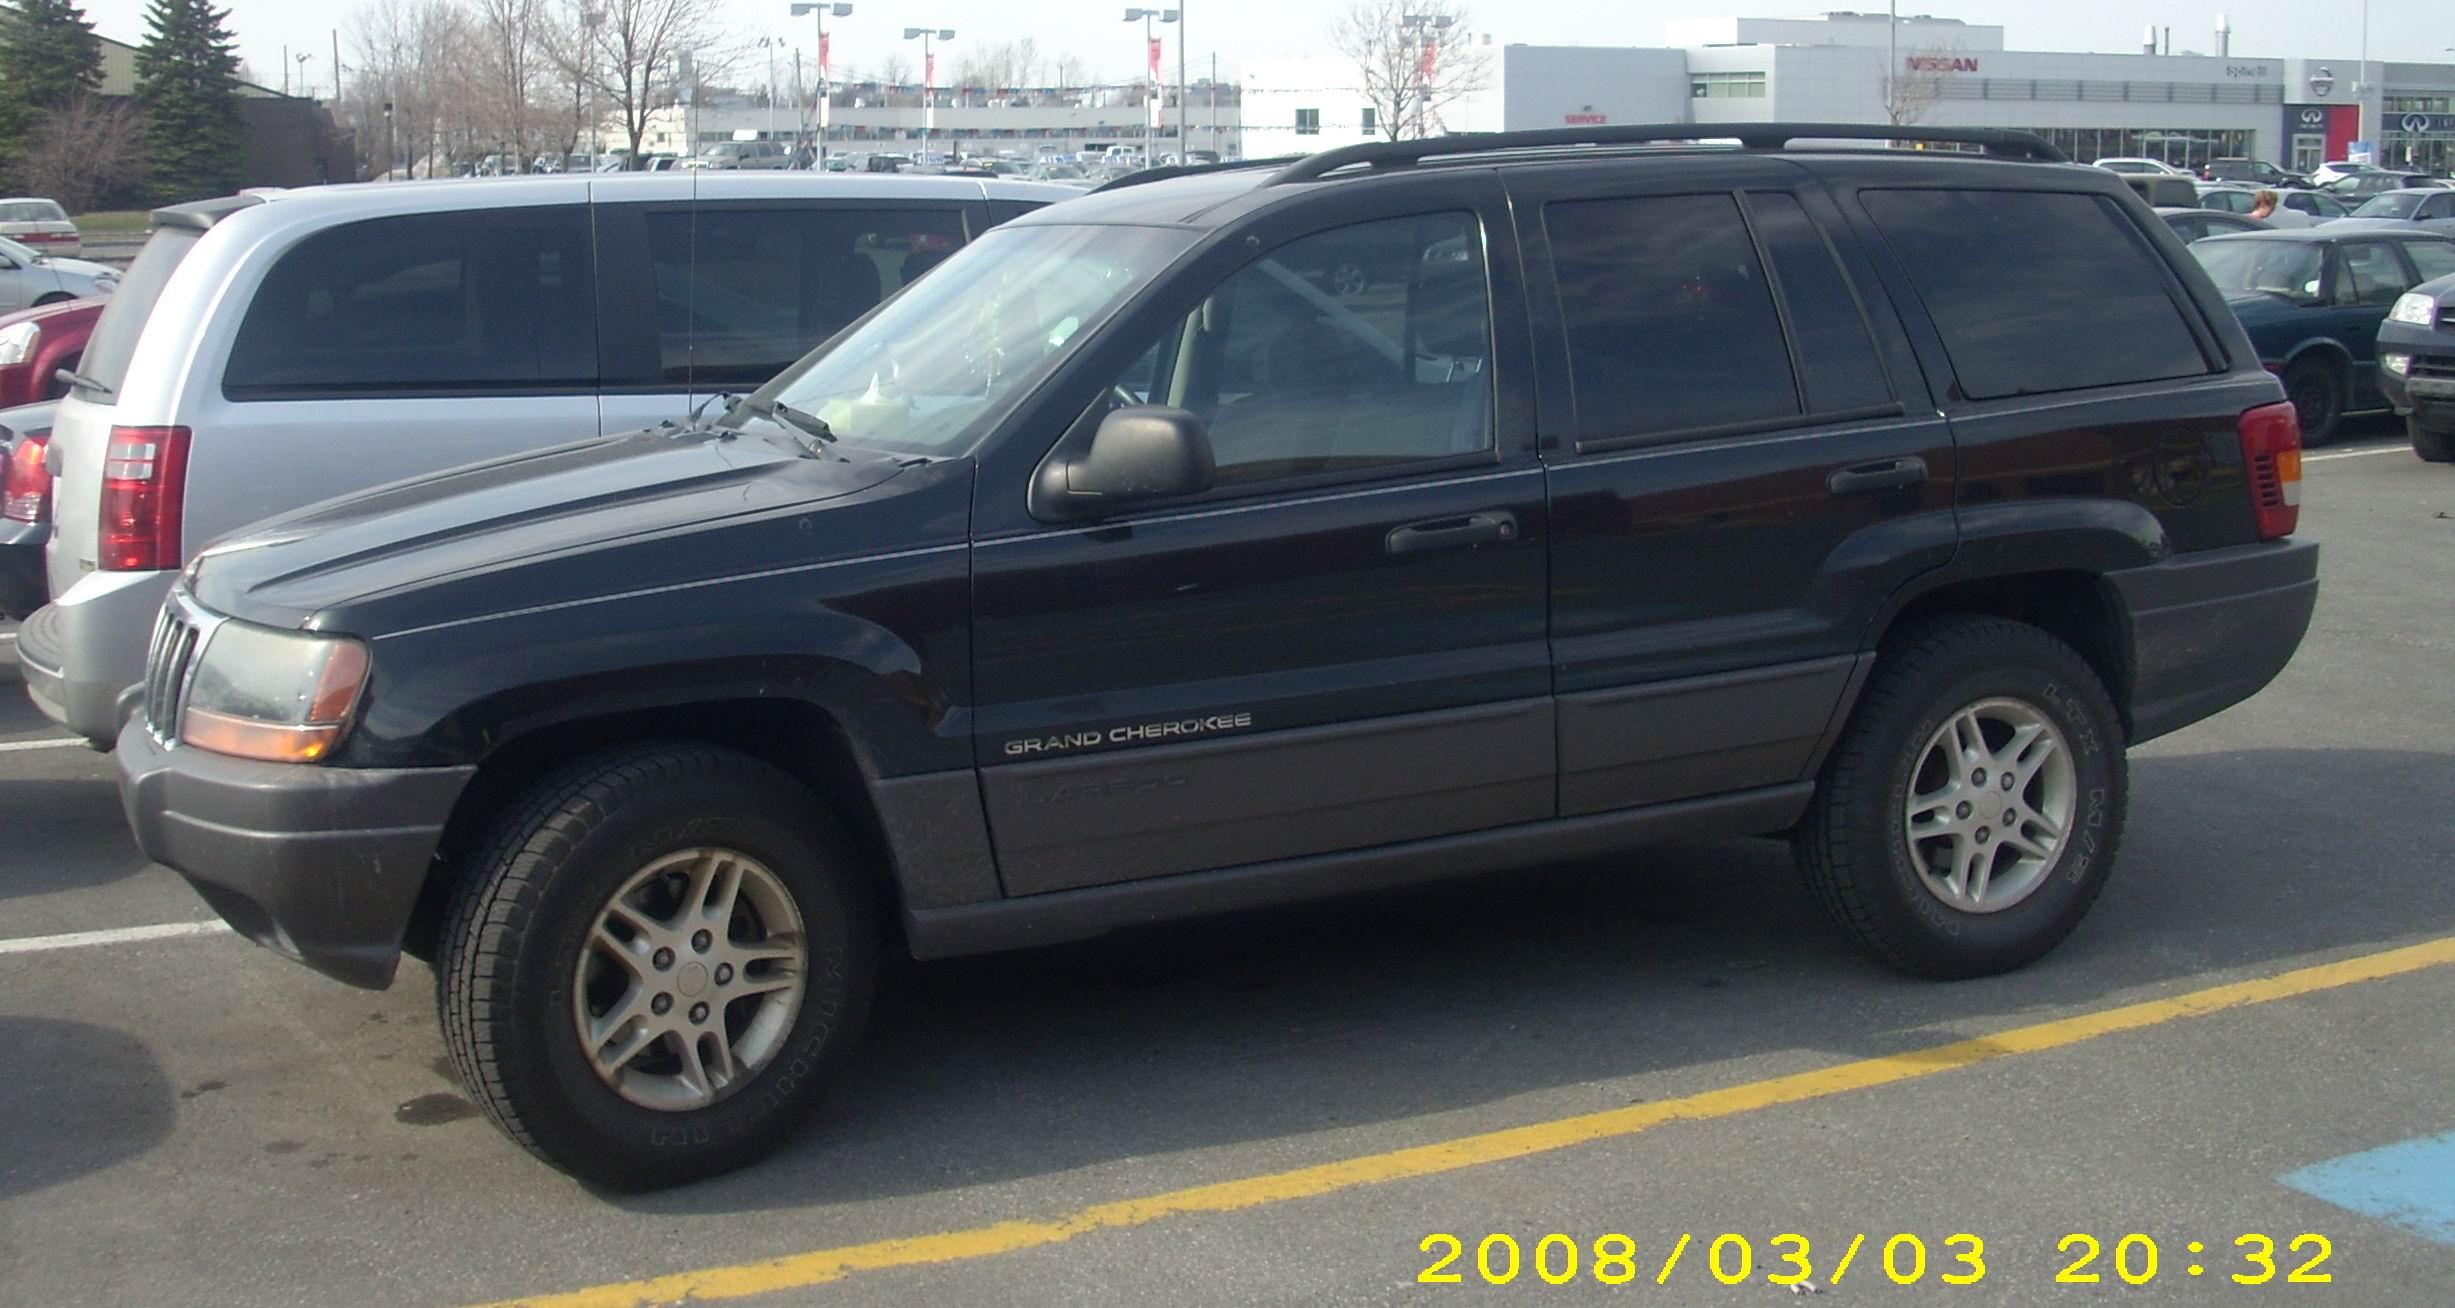 2003 Jeep Grand Cherokee #2 Jeep Grand Cherokee #2